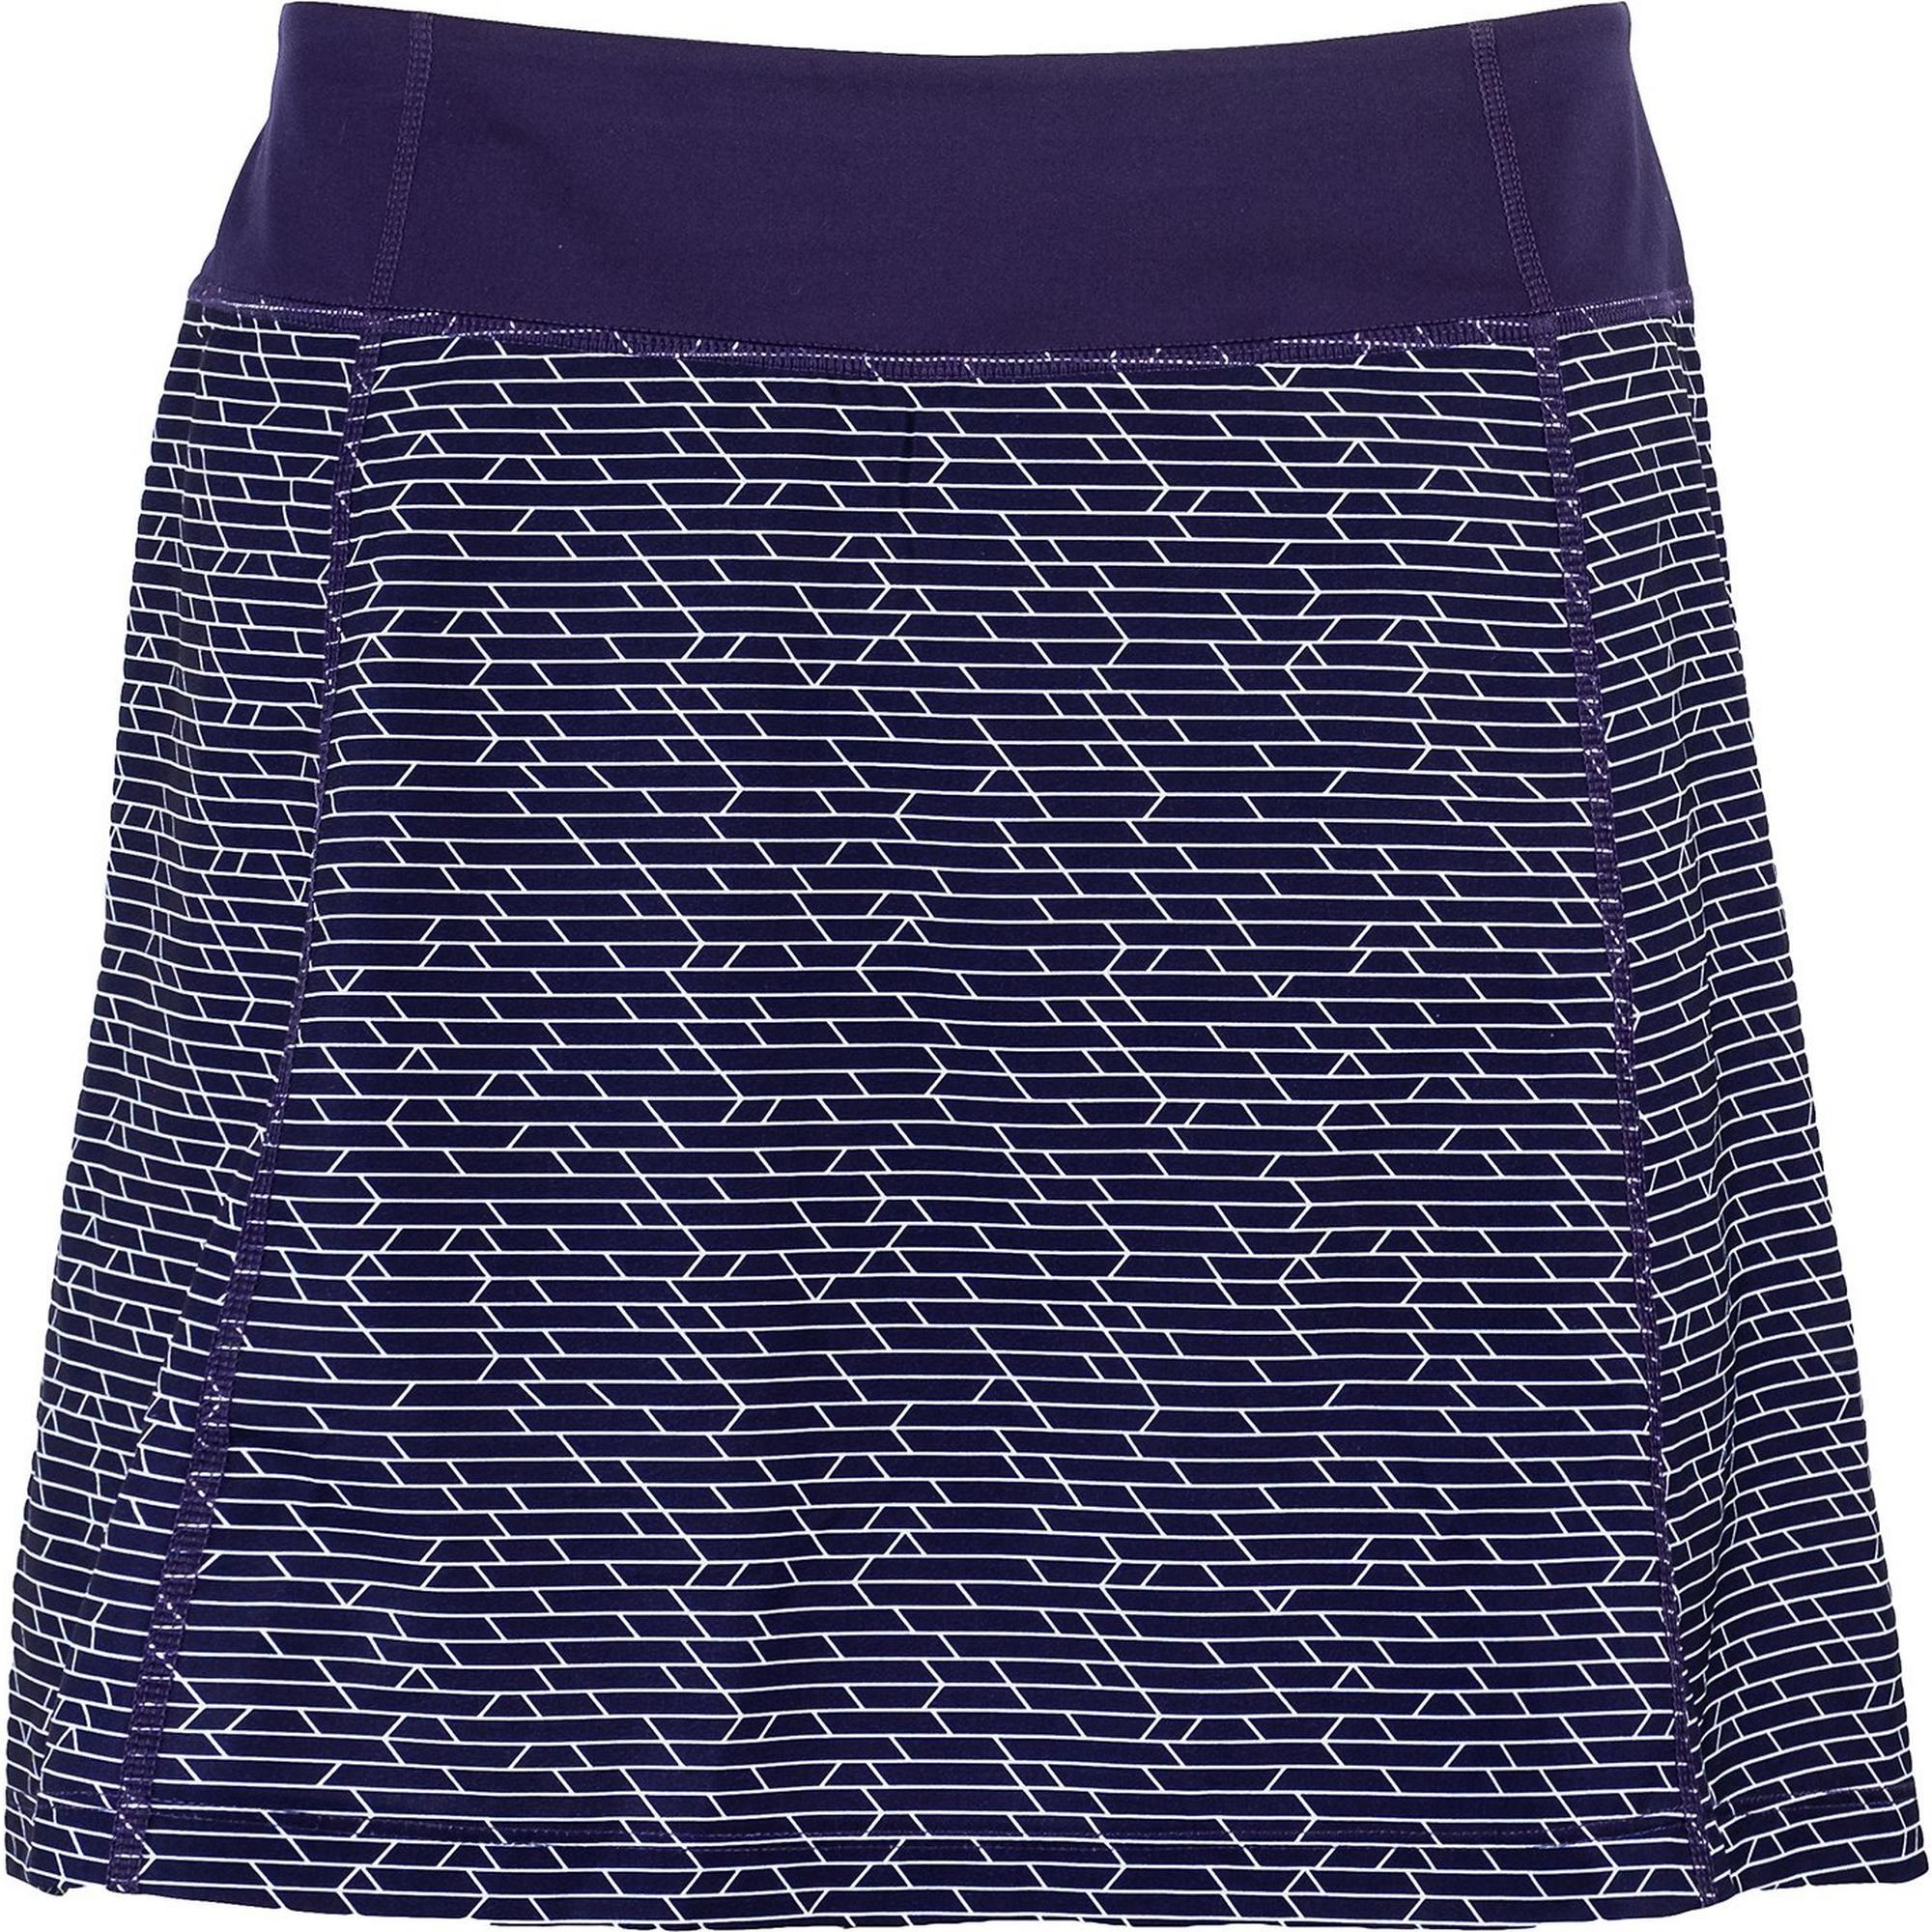 Women's Printed Knit Woven Fashion Skort